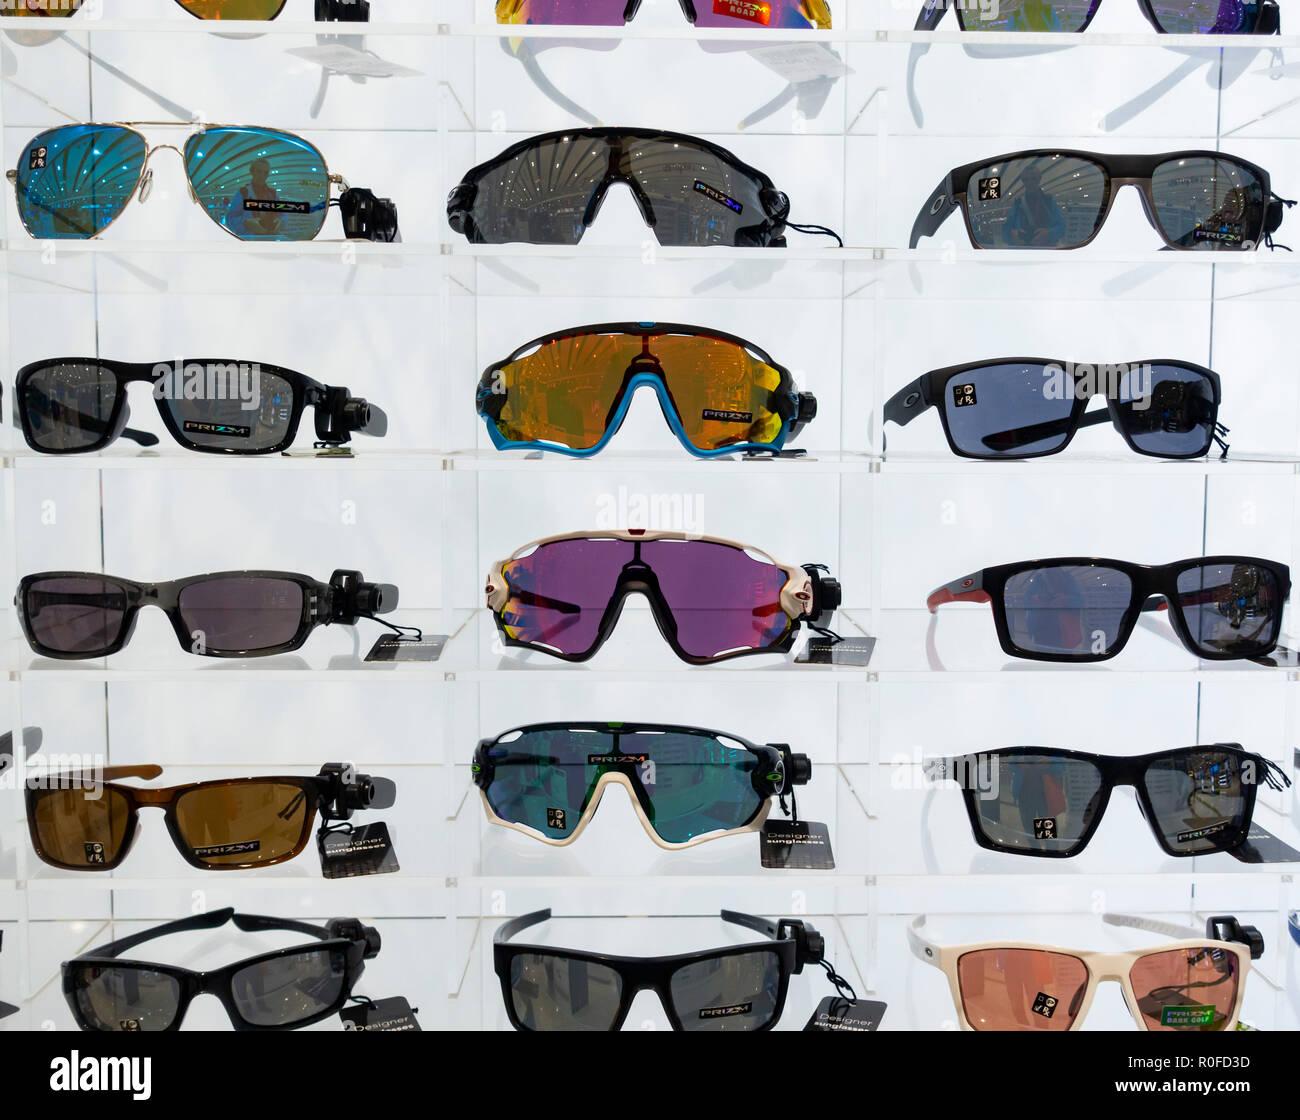 342aec3c79758 Oakley Sunglasses Stock Photos   Oakley Sunglasses Stock Images - Alamy